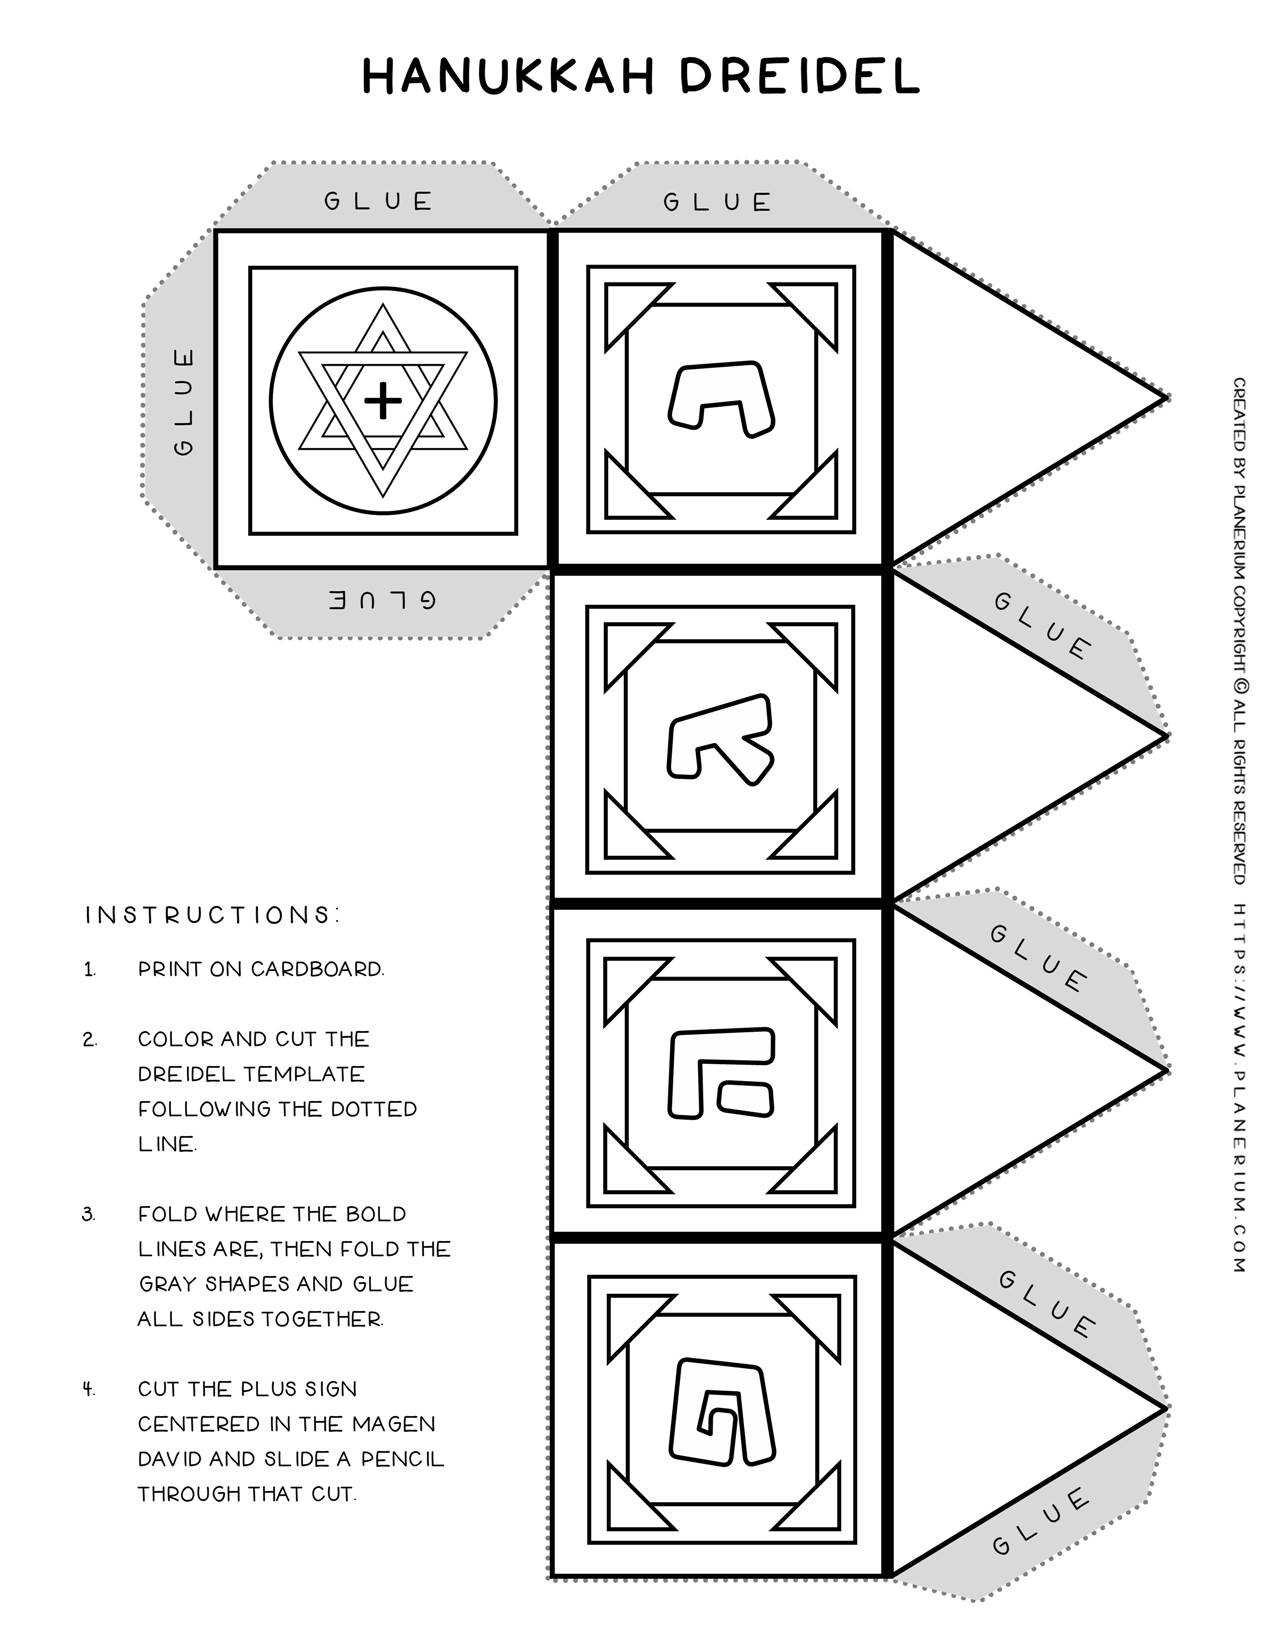 Dreidel Template - How to make a dreidel with the letter Pey - Hanukkah Worksheet | Planerium